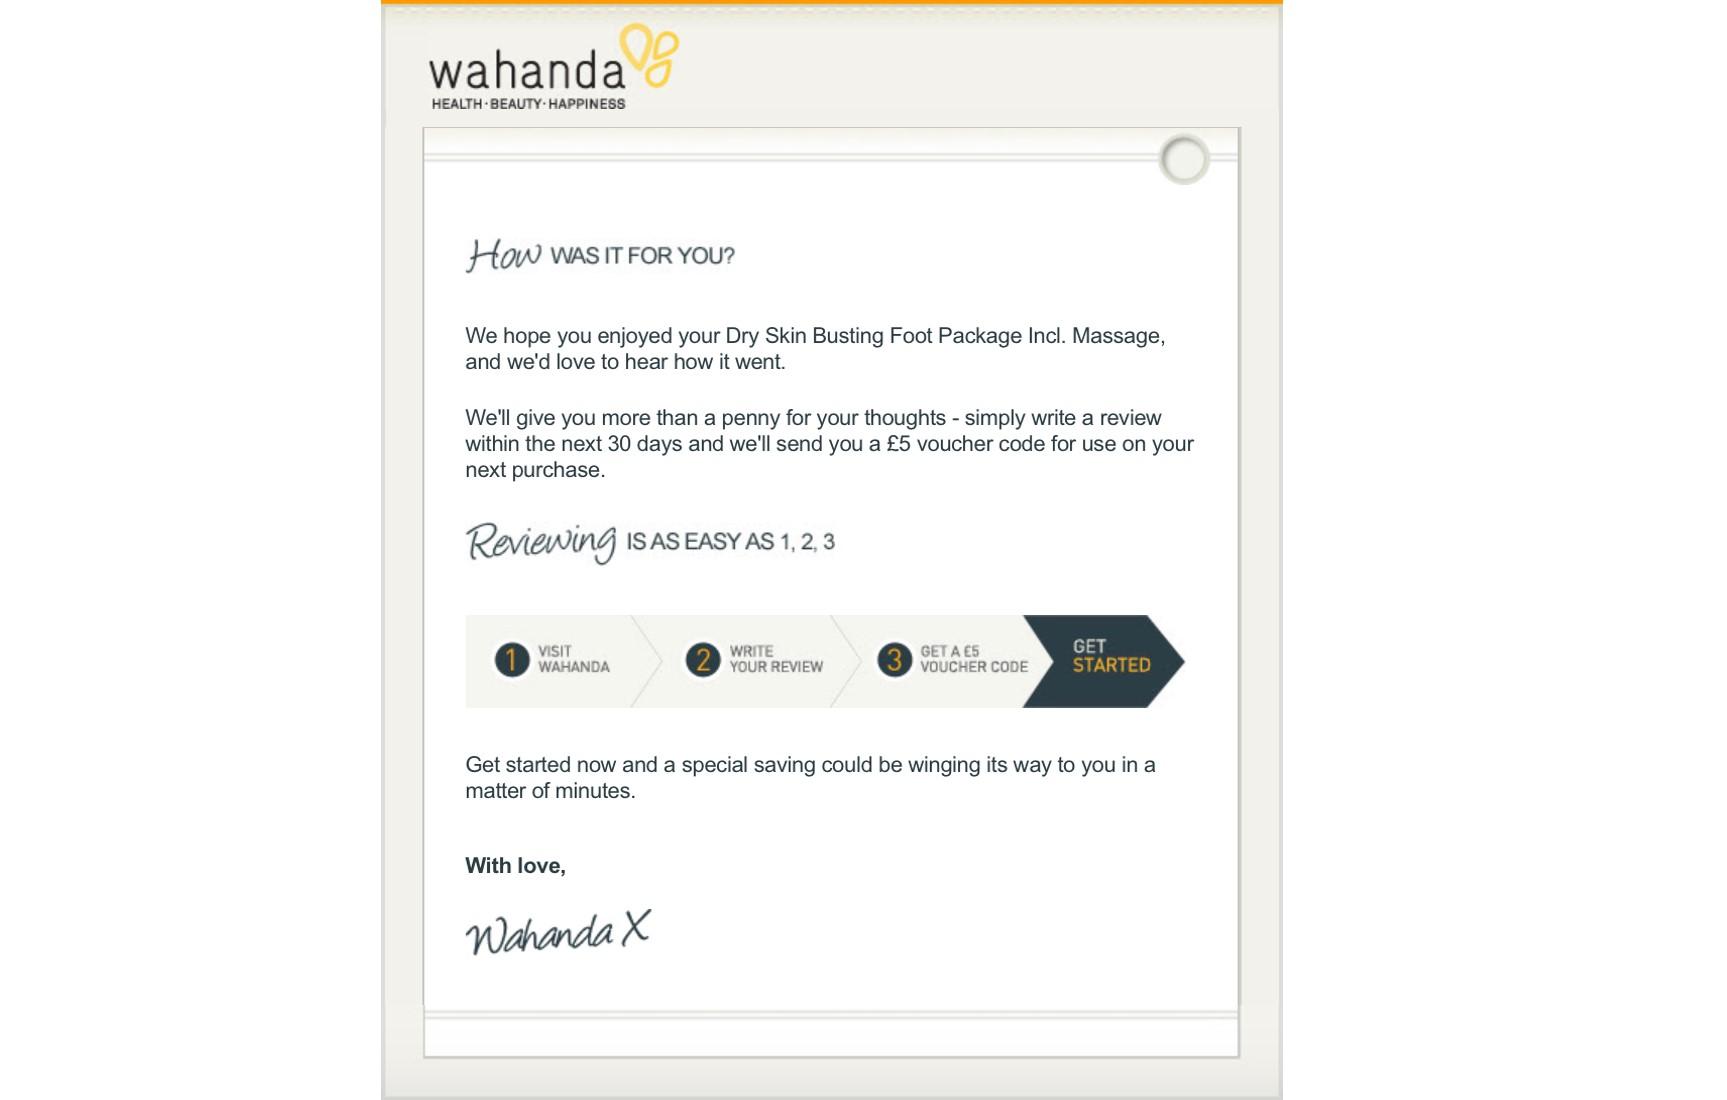 Screenshot of email from Wahanda